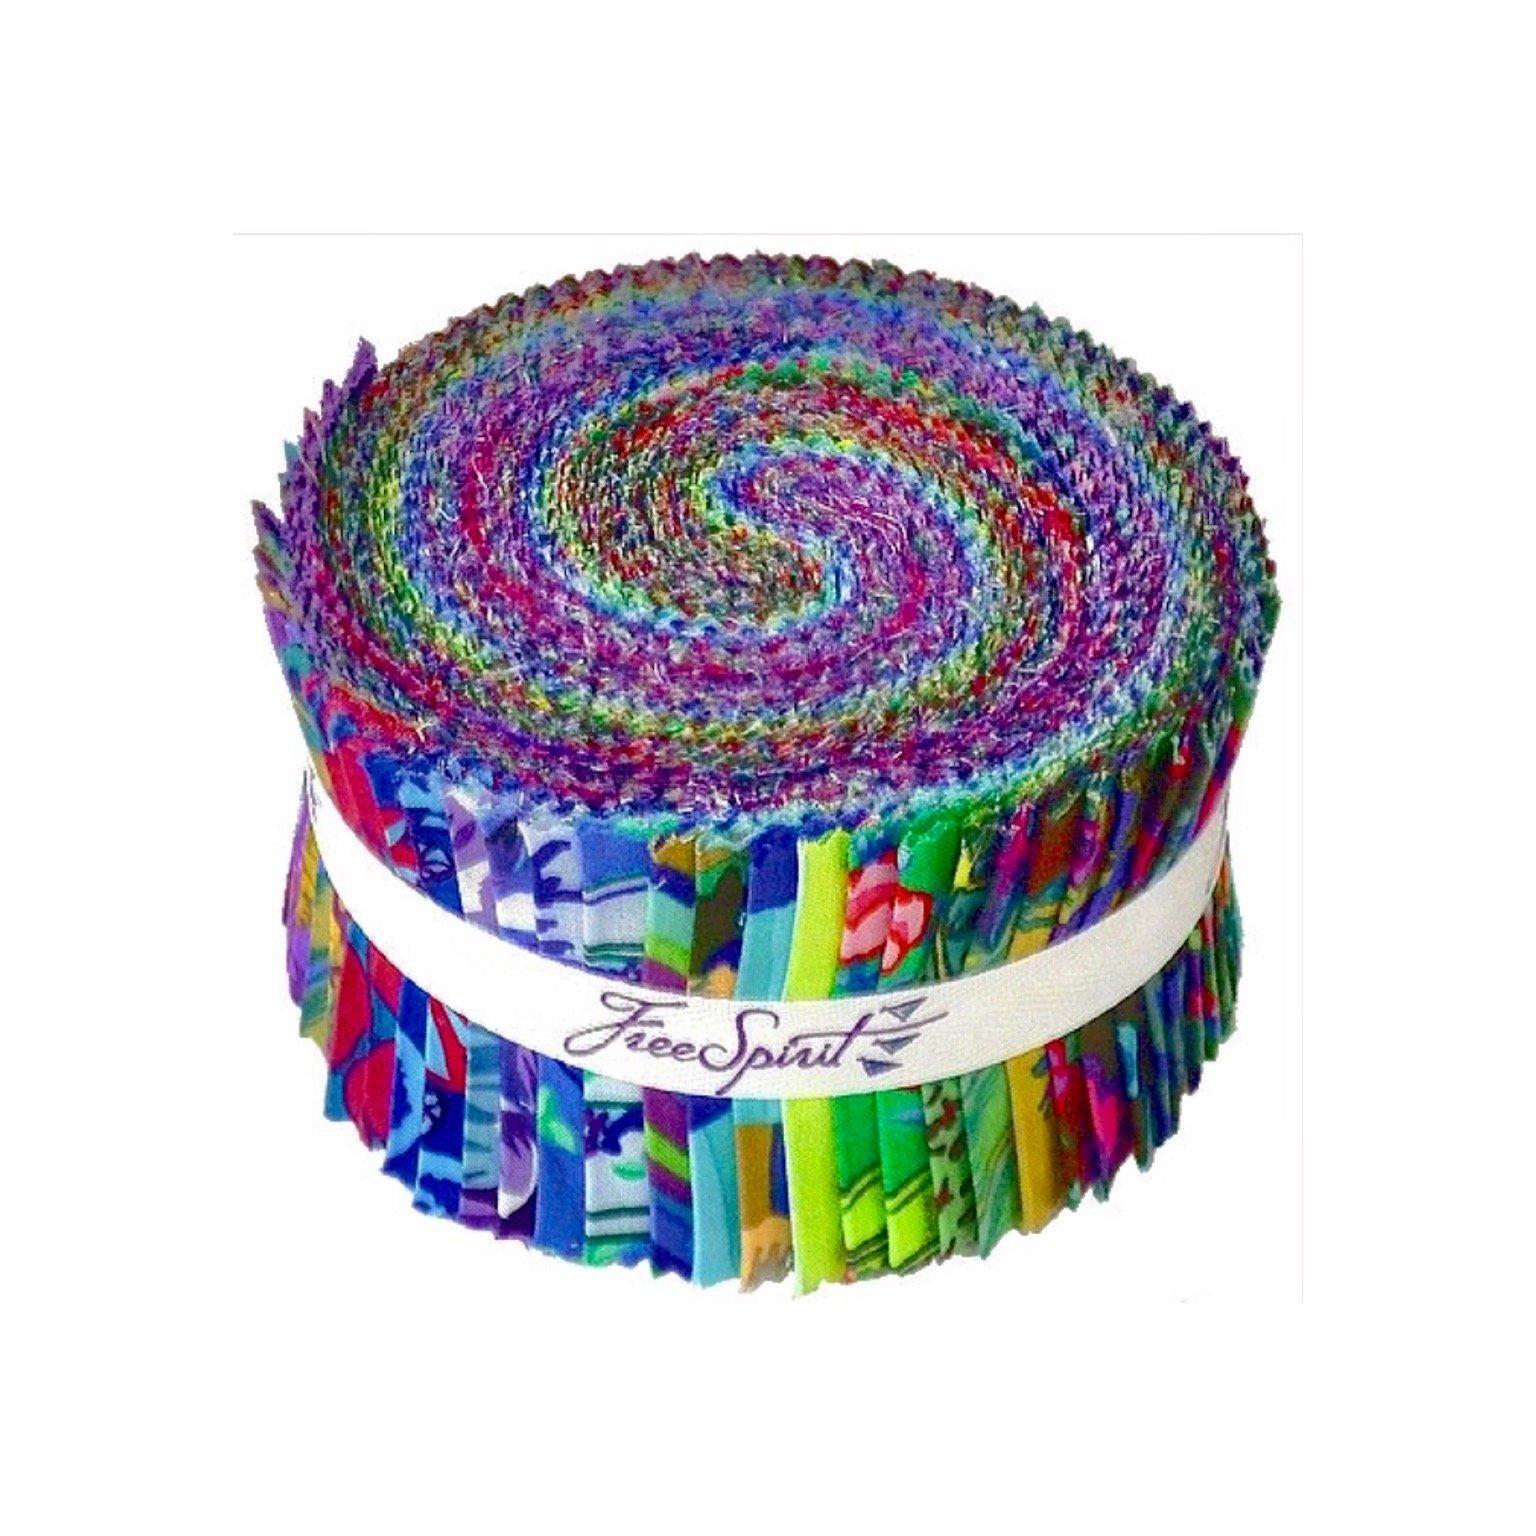 Free Spirit - Kaffe Fasset - Fall Collective - Design Roll - Dusk - (40 Peices)